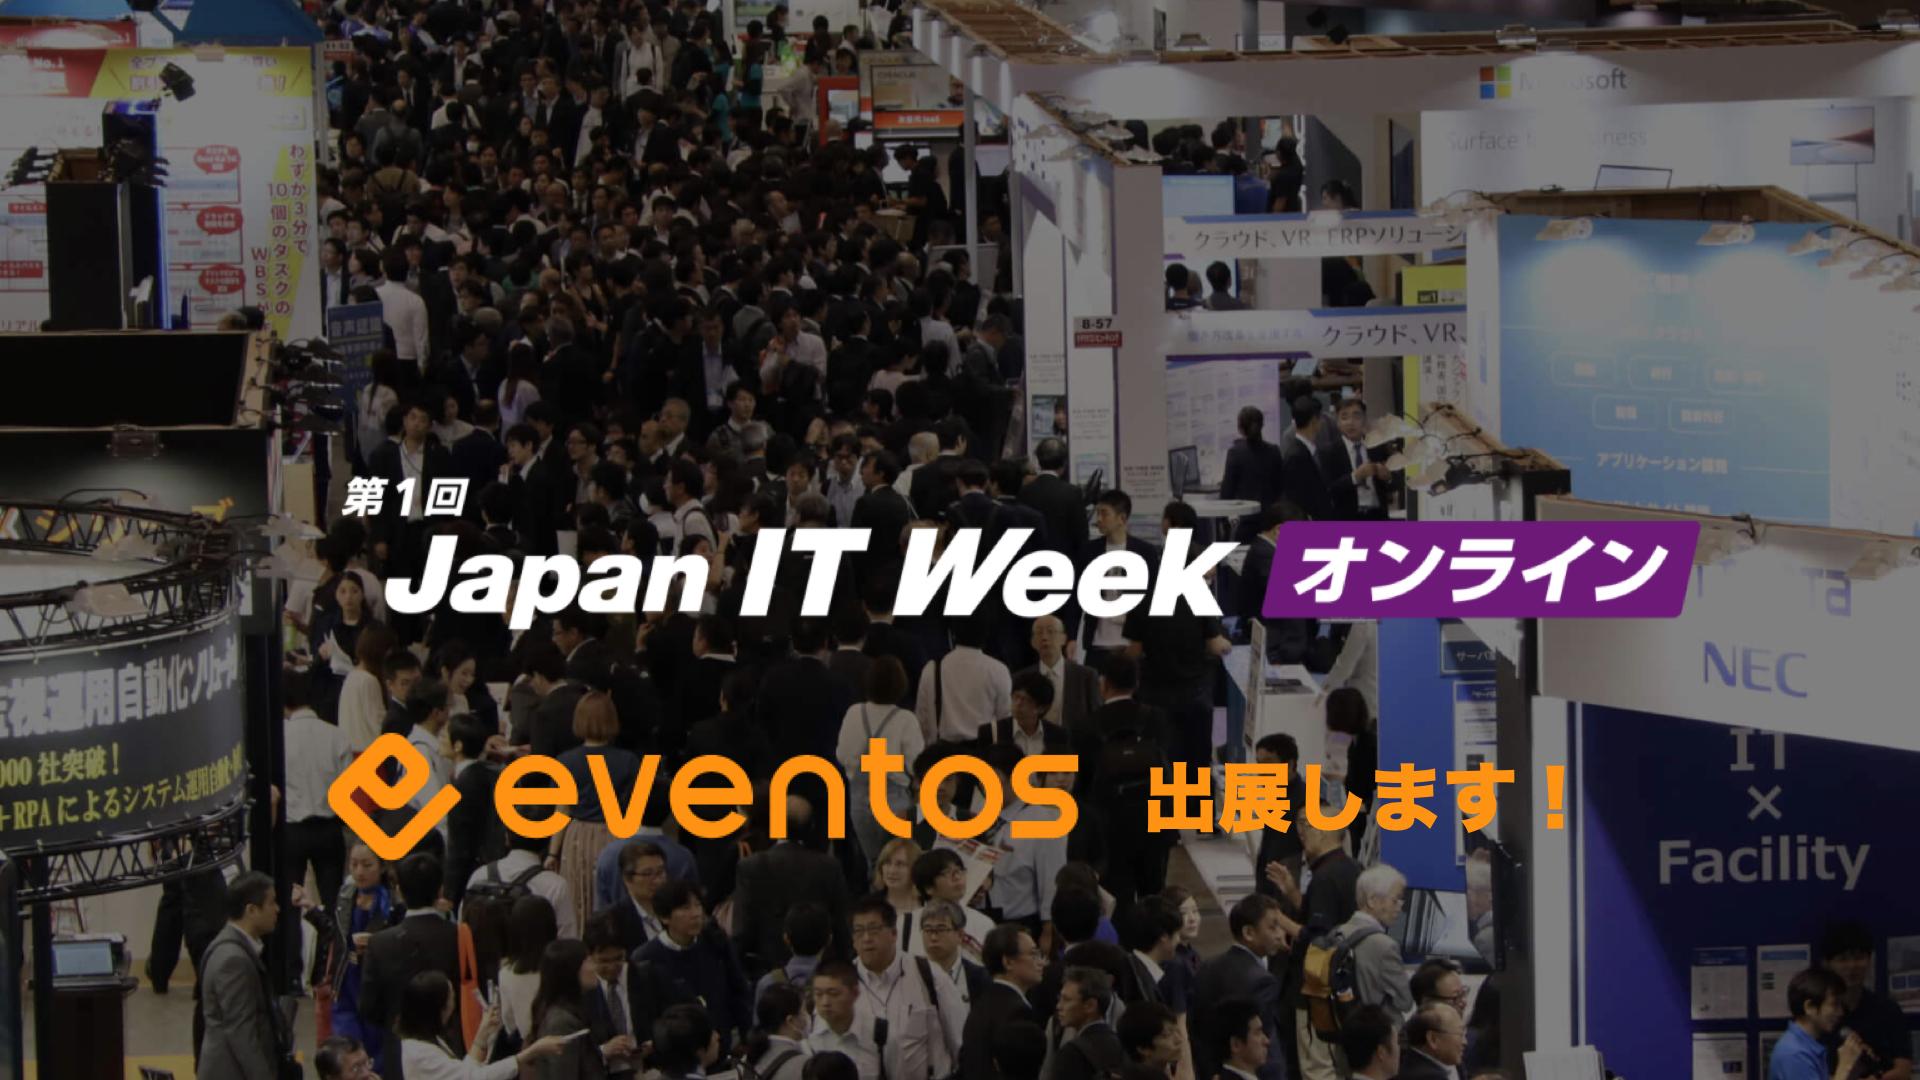 Japan IT Weekオンラインにeventos出展